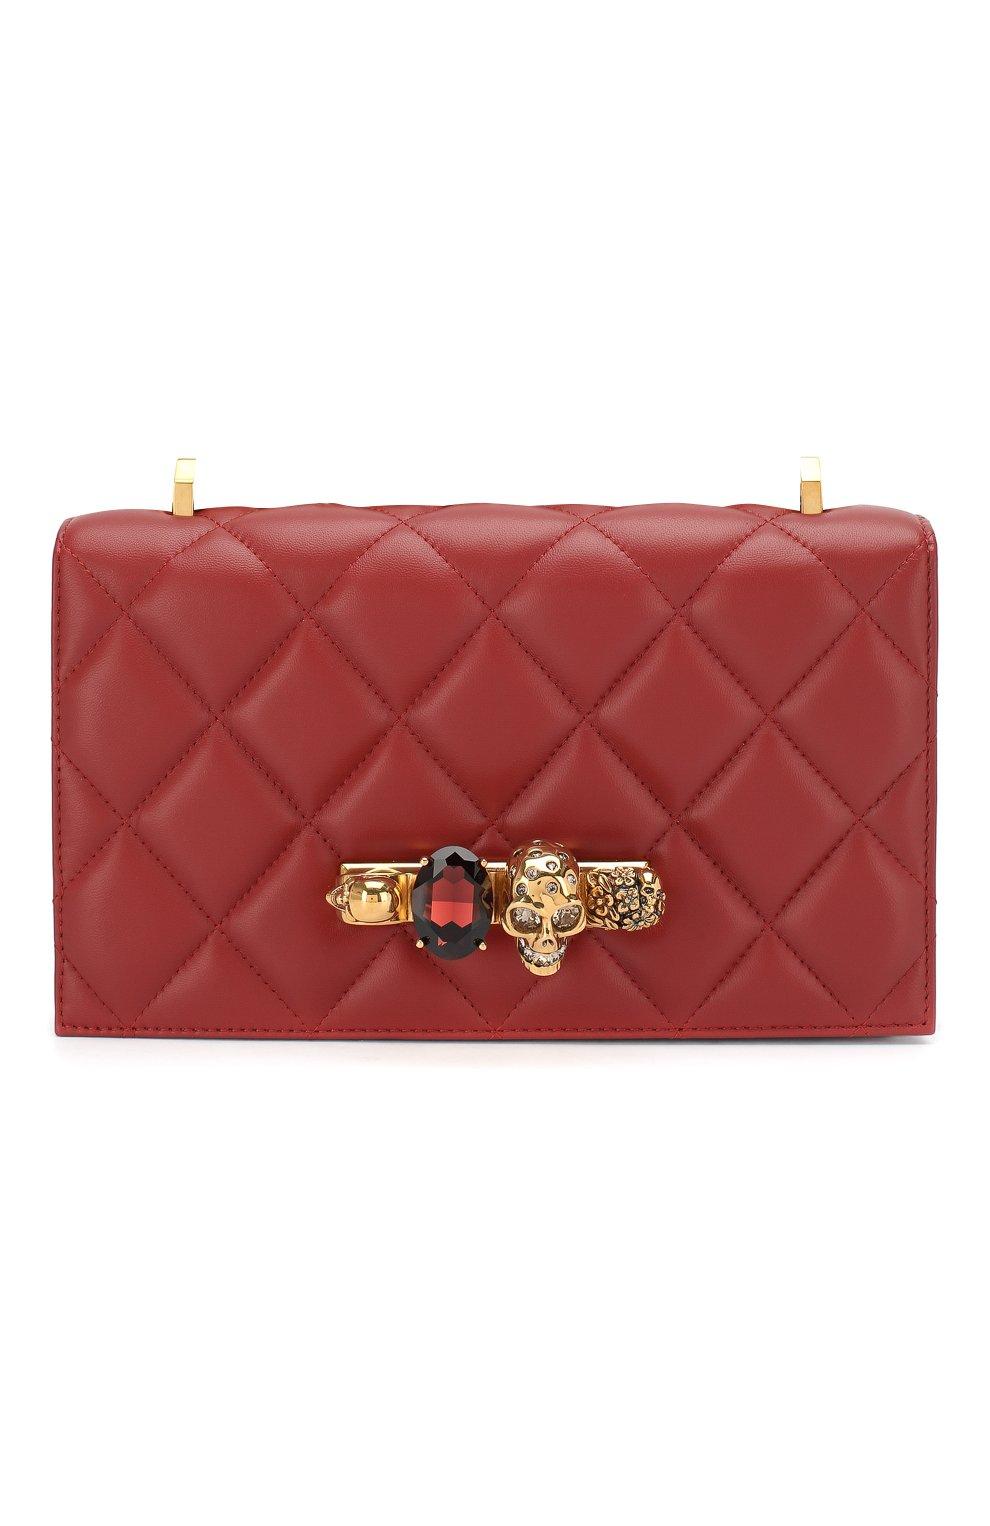 Сумка Jewelled Satchel Alexander McQueen красная цвета   Фото №1